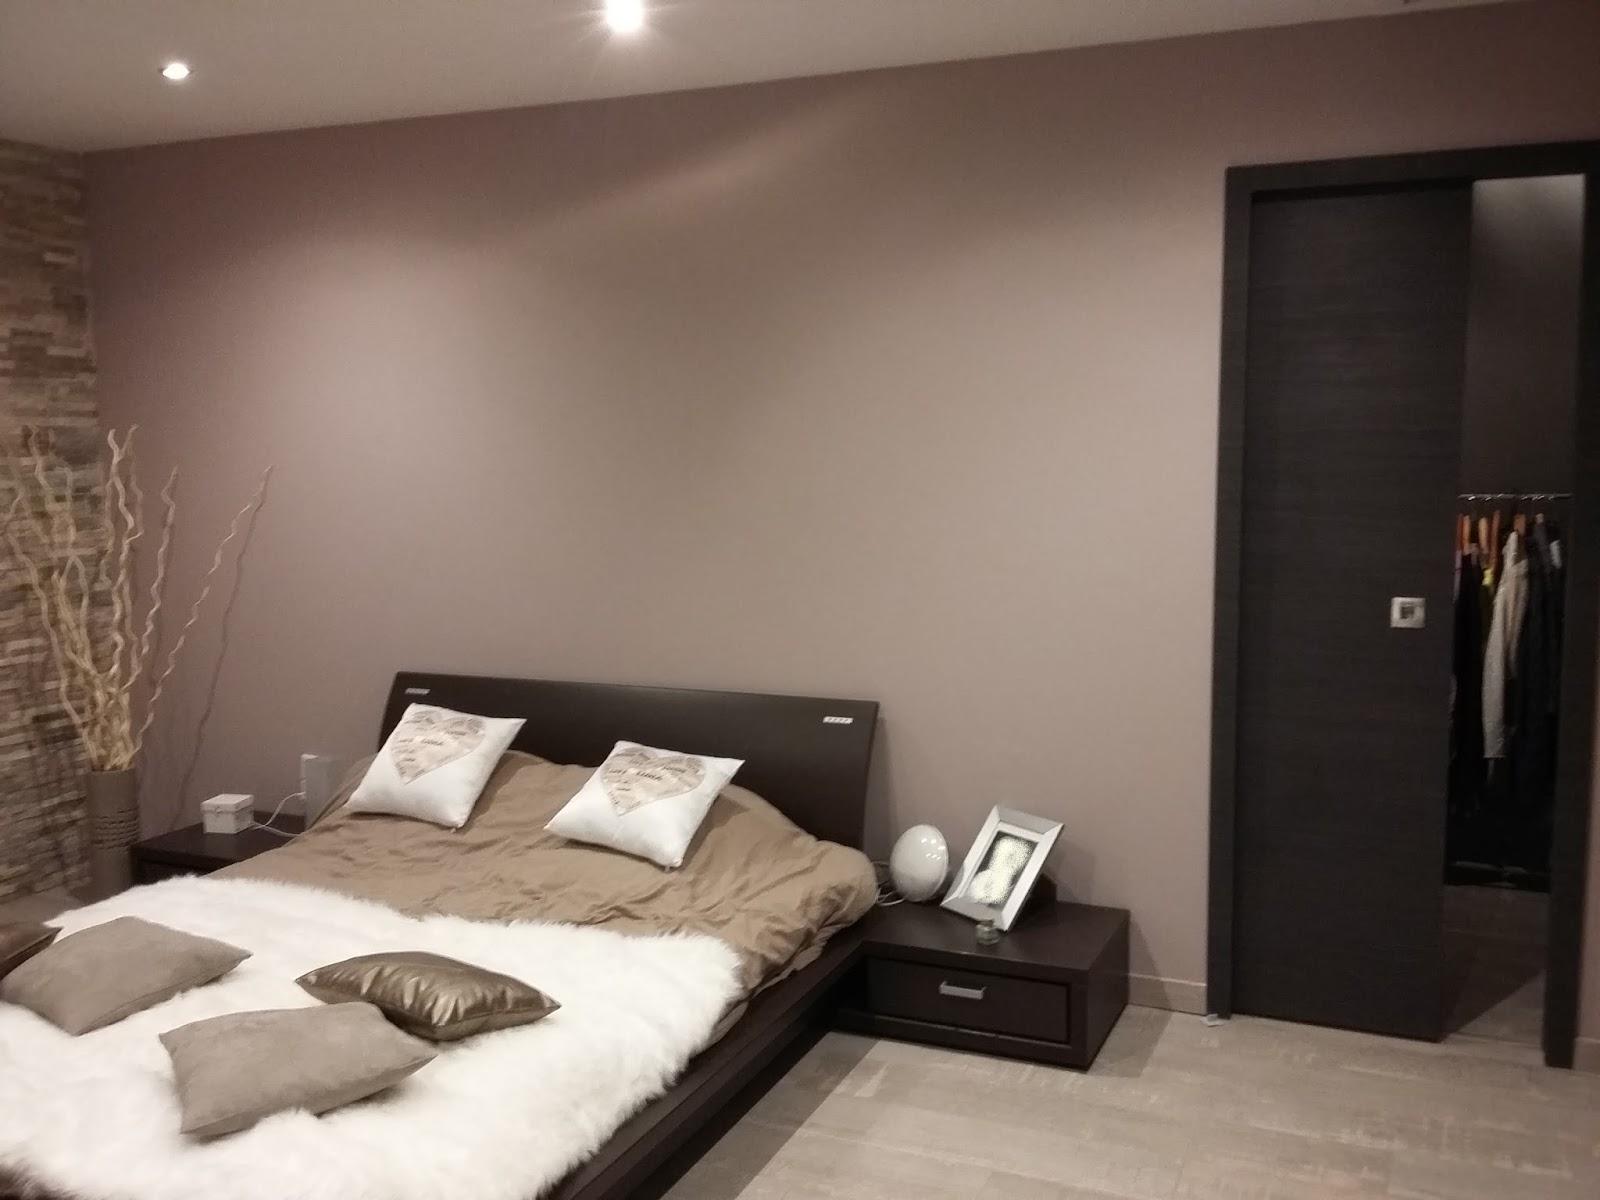 Emejing Chambre Marron Et Rose Gallery - House Design - marcomilone.com